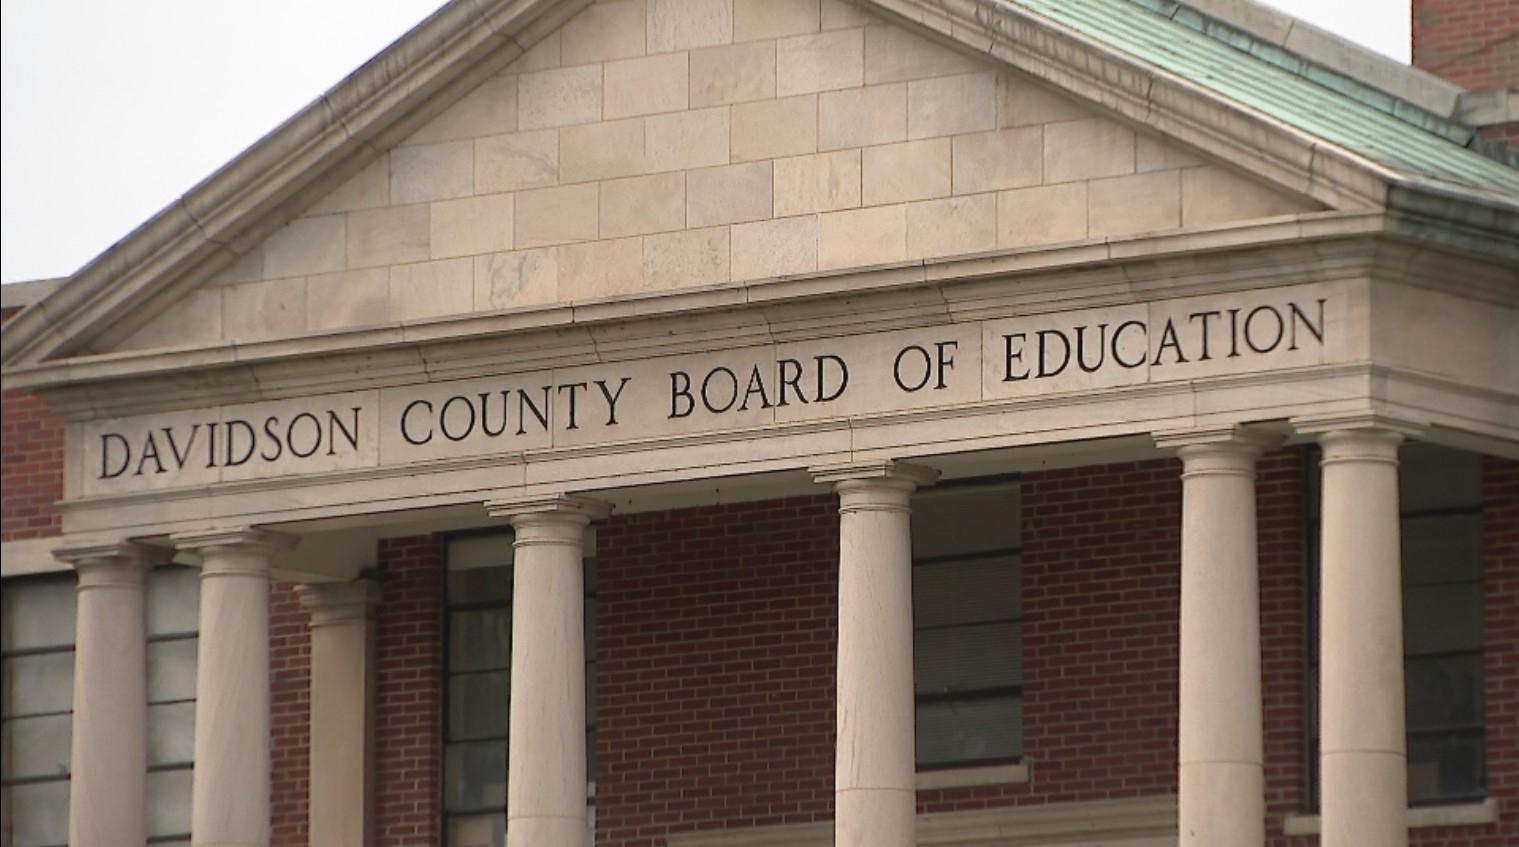 Metro Board Of Public Education Discuss Closing Four Schools Regarding Davidson County Tn School Calendar 2021 2020